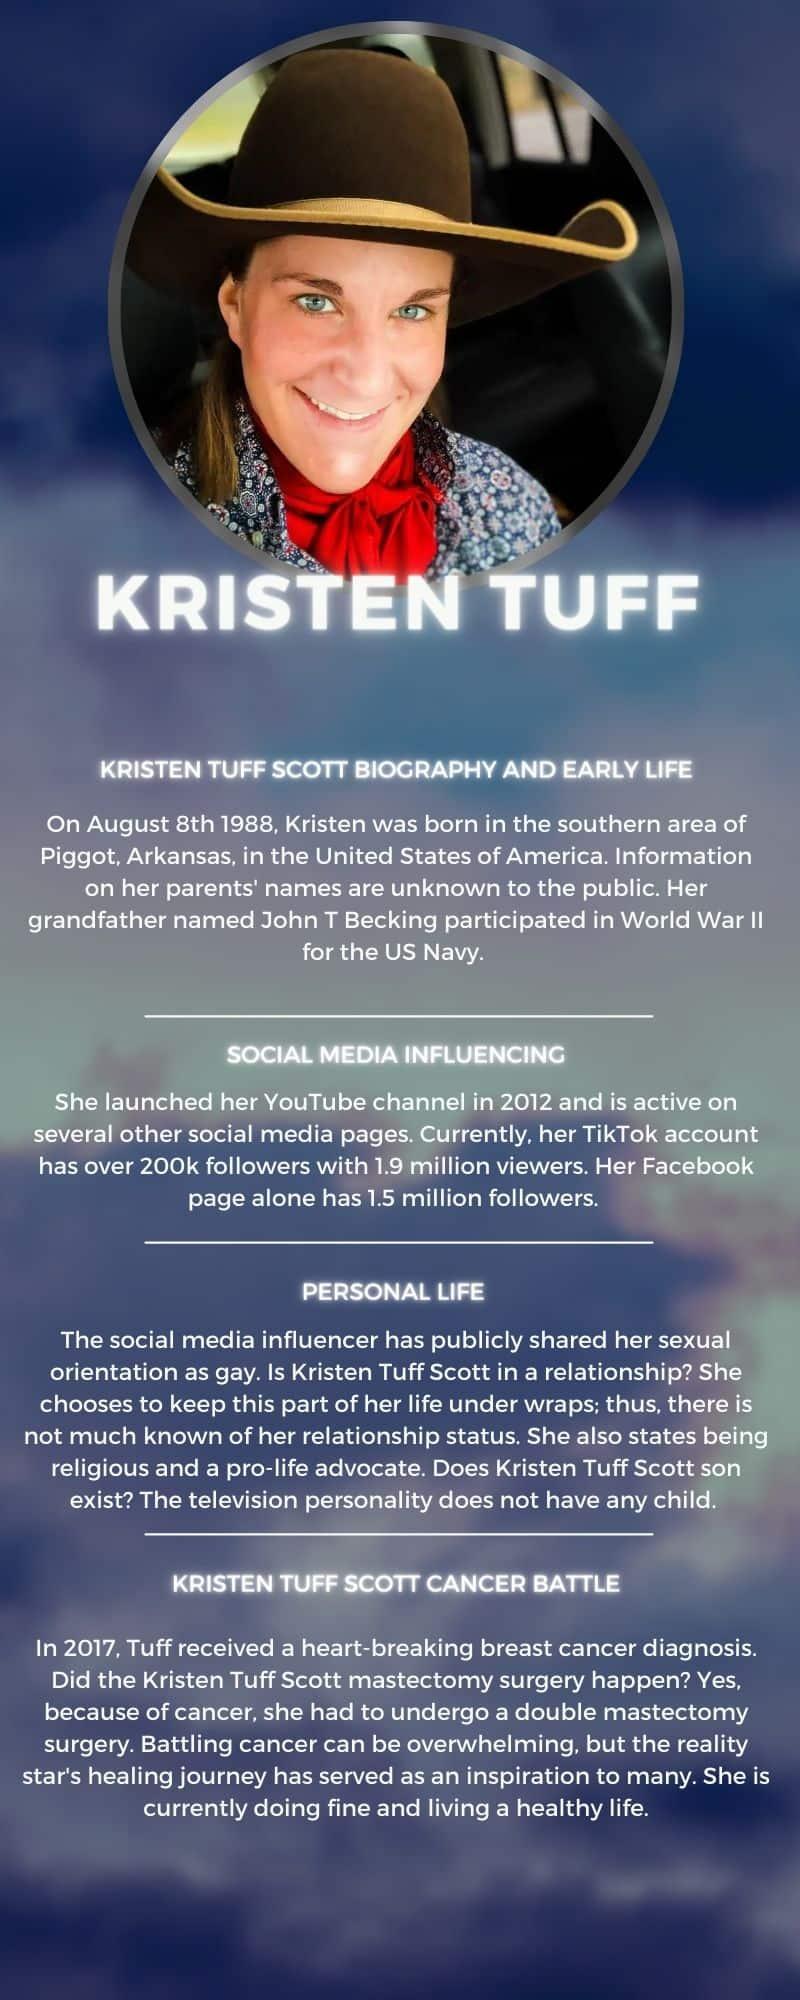 Kristen Tuff Scott